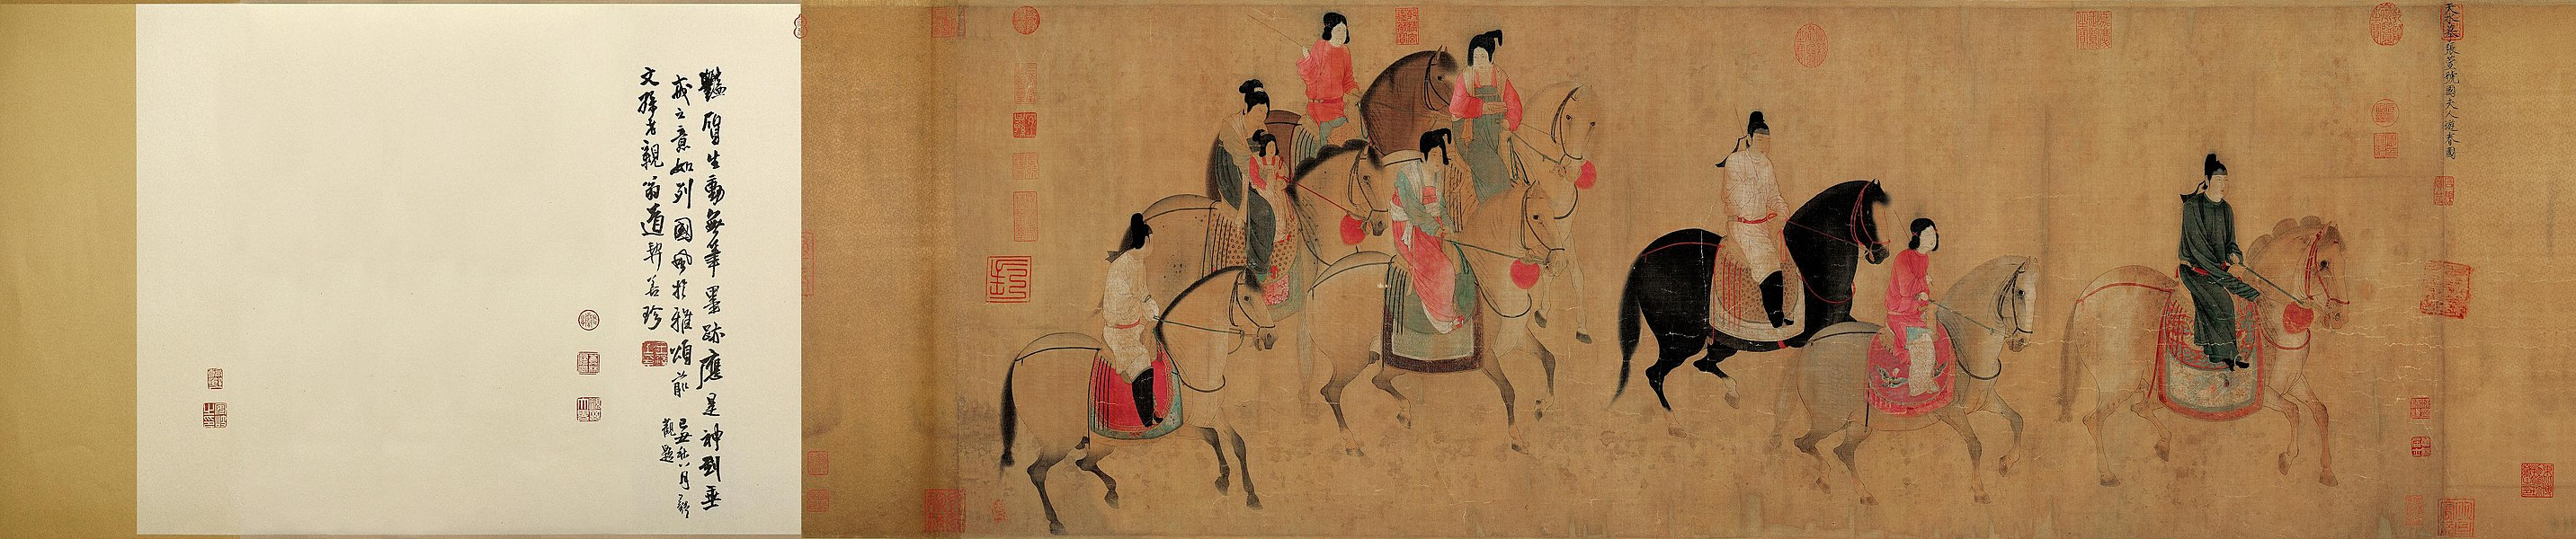 zhang xuan - image 2